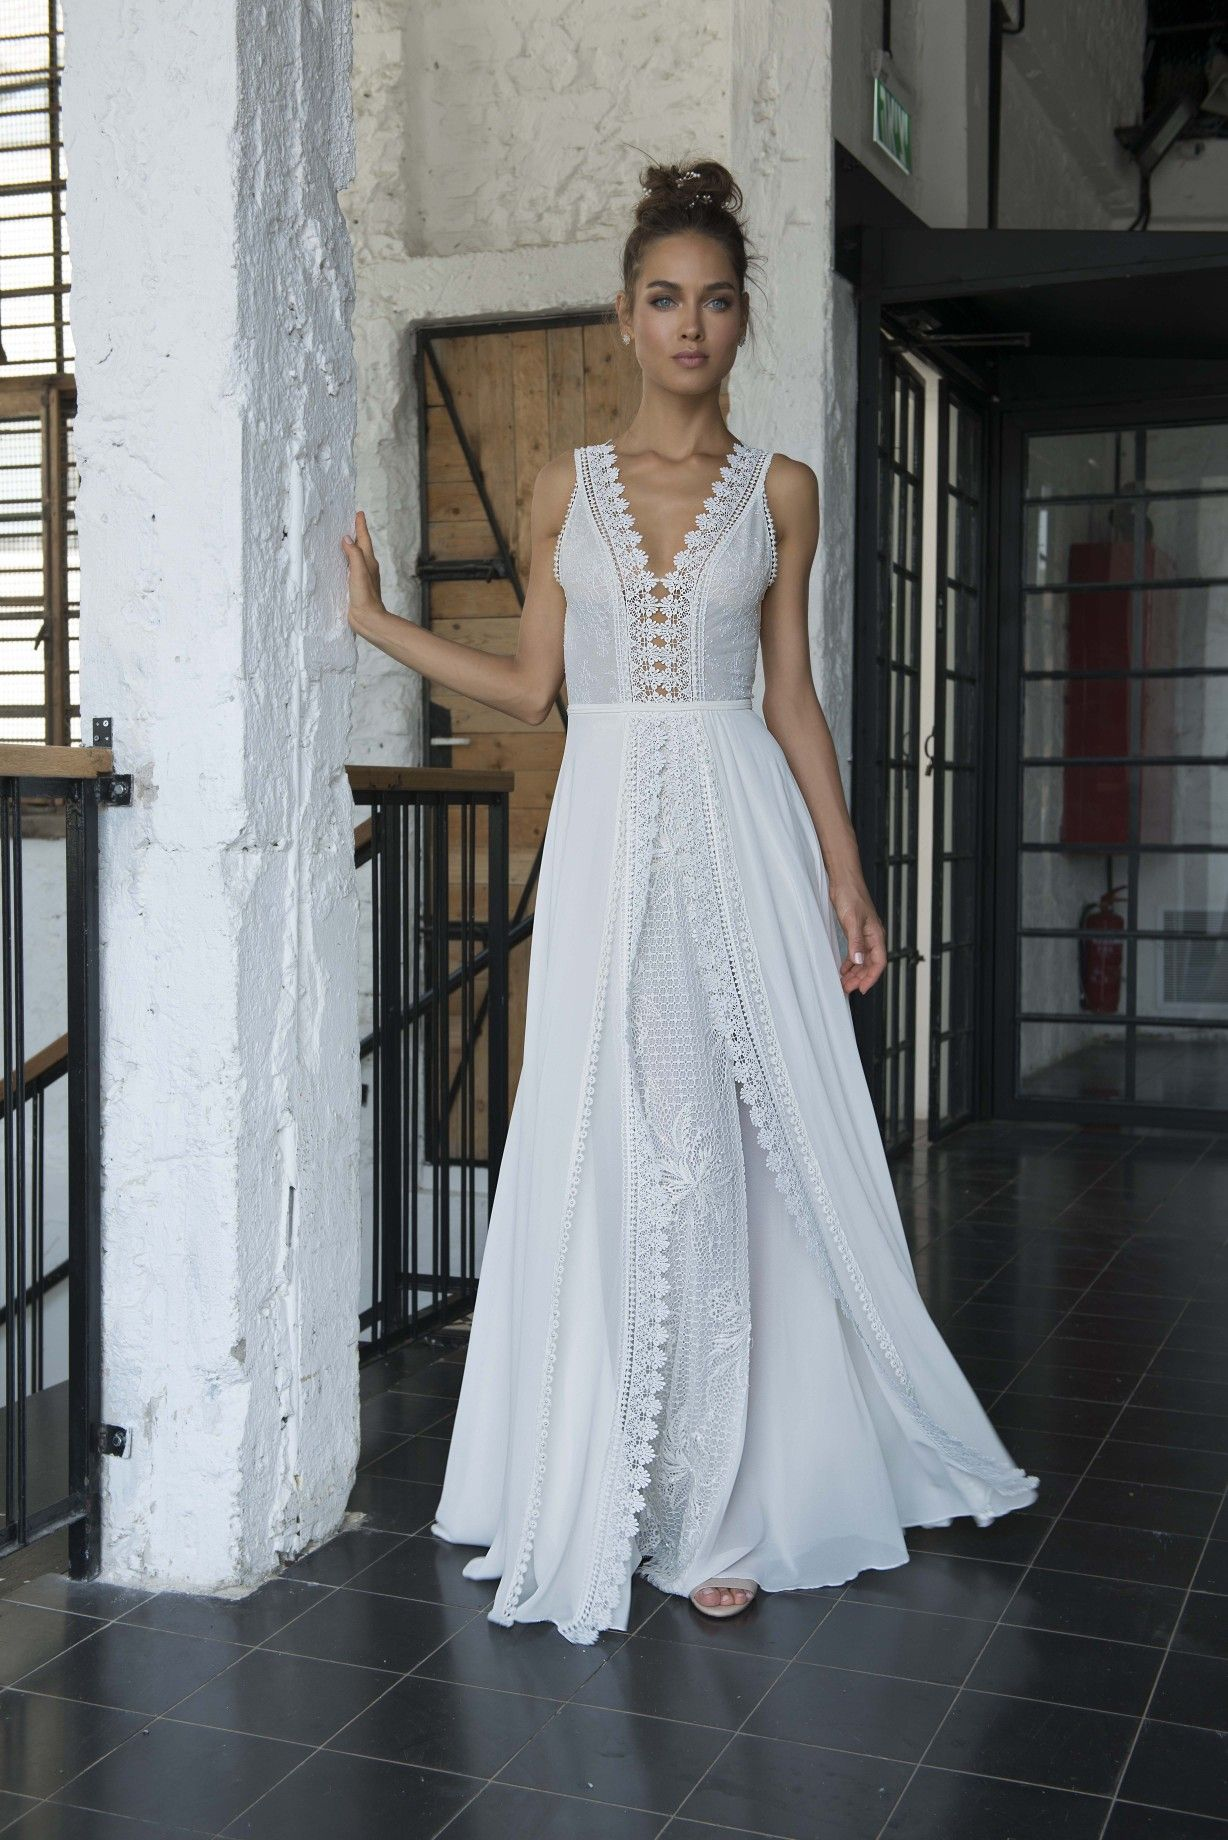 Funky Wedding Dresses Binghamton Ny Model - Womens Dresses & Gowns ...